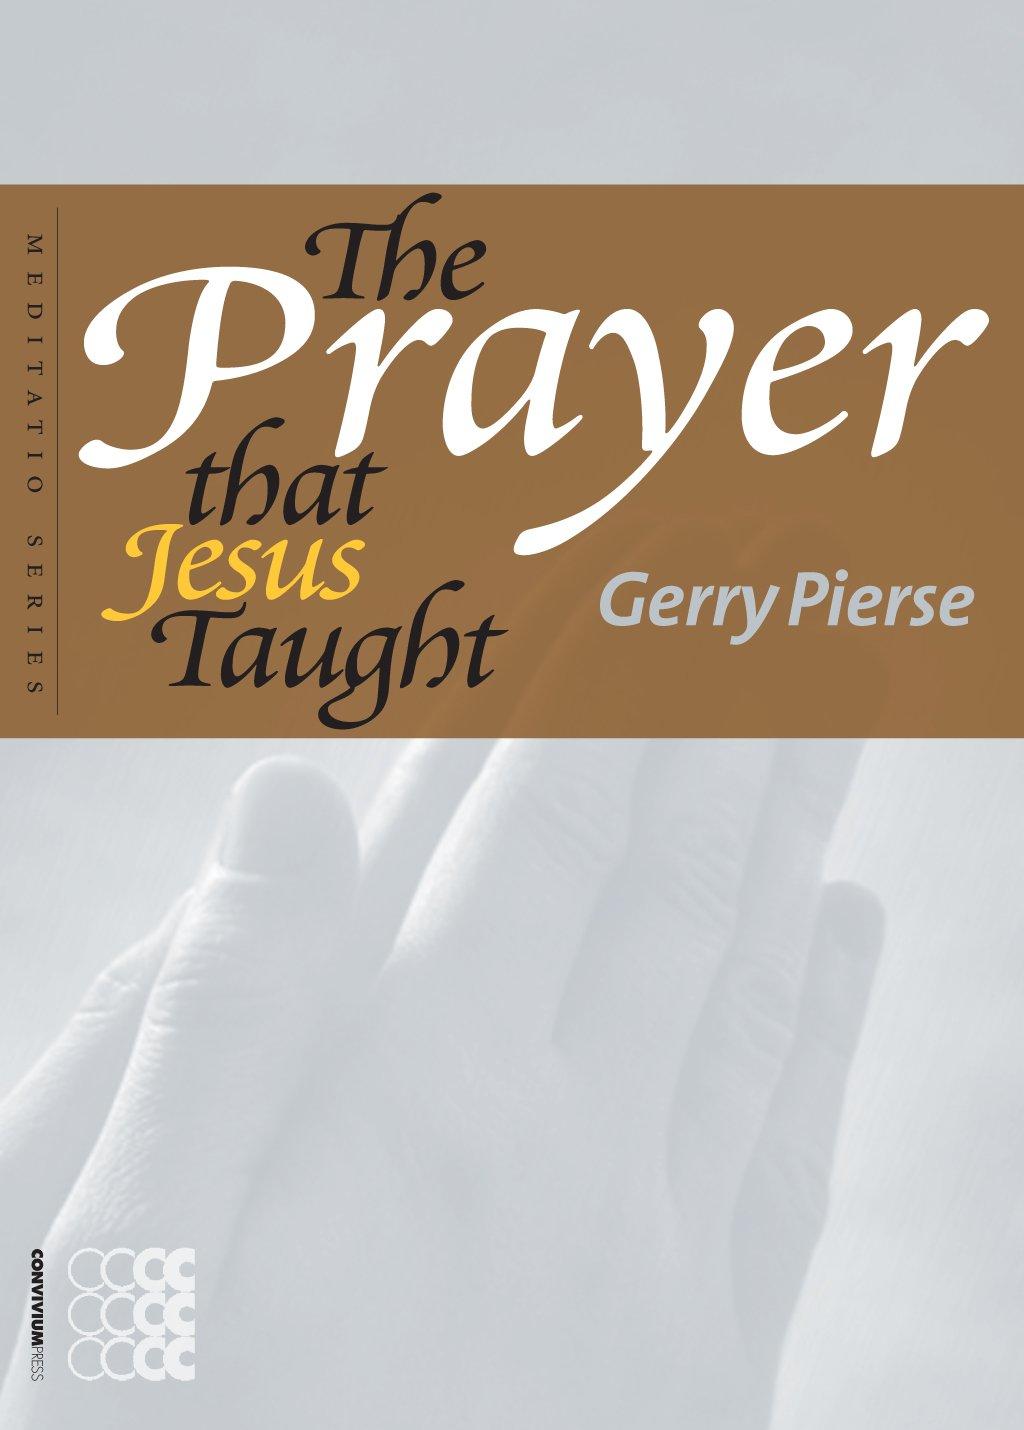 The Prayer That Jesus Taught (Meditatio) PDF